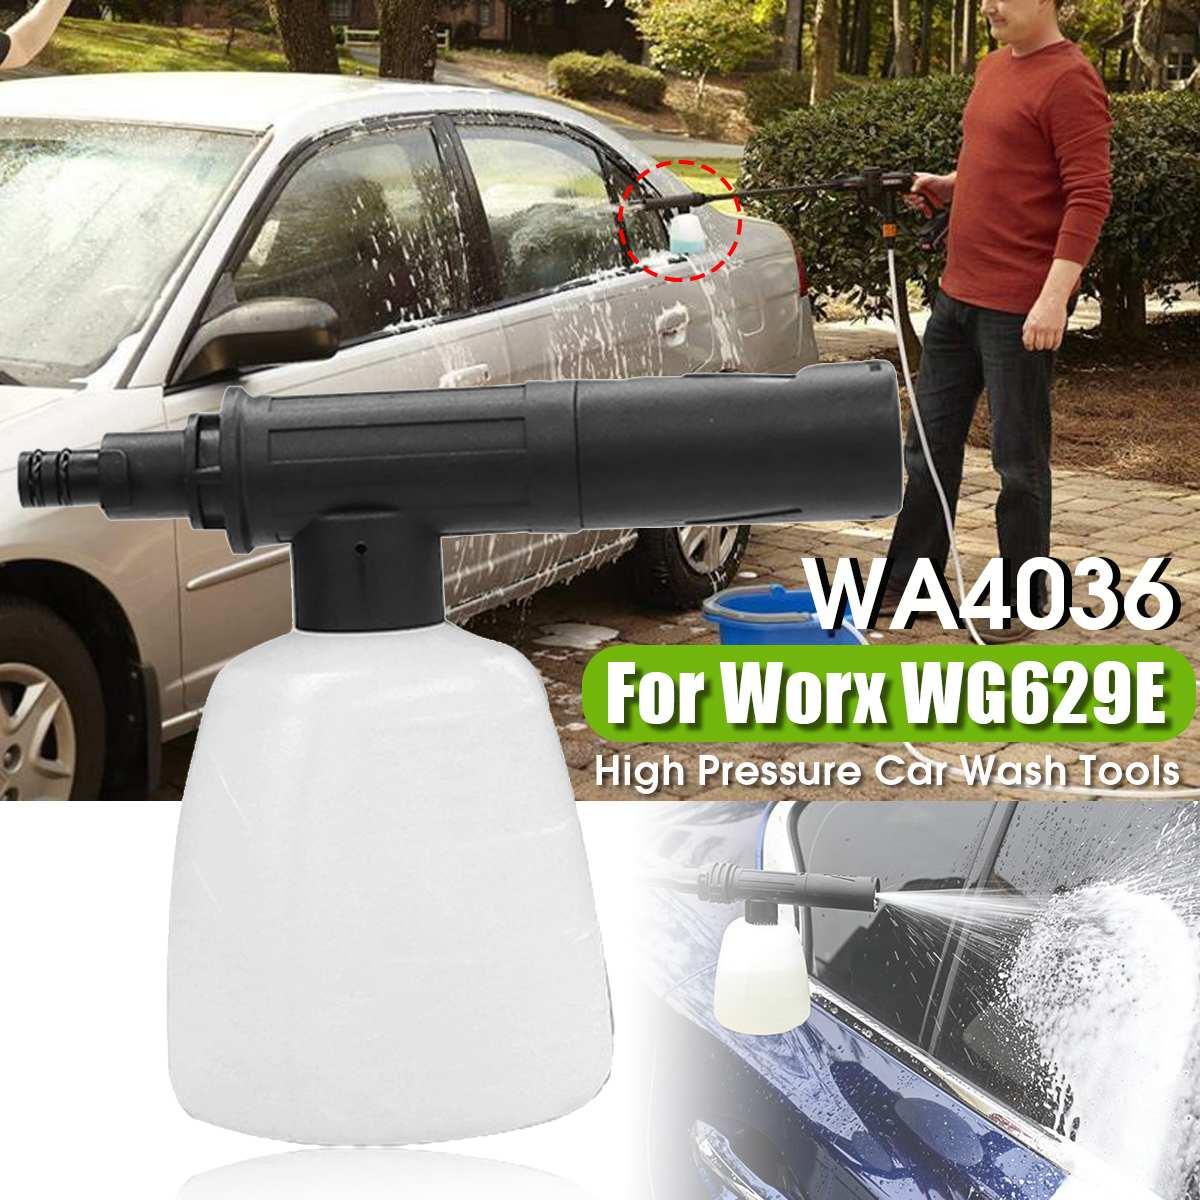 Short Lance Nozzle Soap Pots For WORX WG629E.1 WG629E.9 WG629E.91 WG629.91 WG629E WG629E.M1 WG629E.M2 WU629 WU644E WA4036